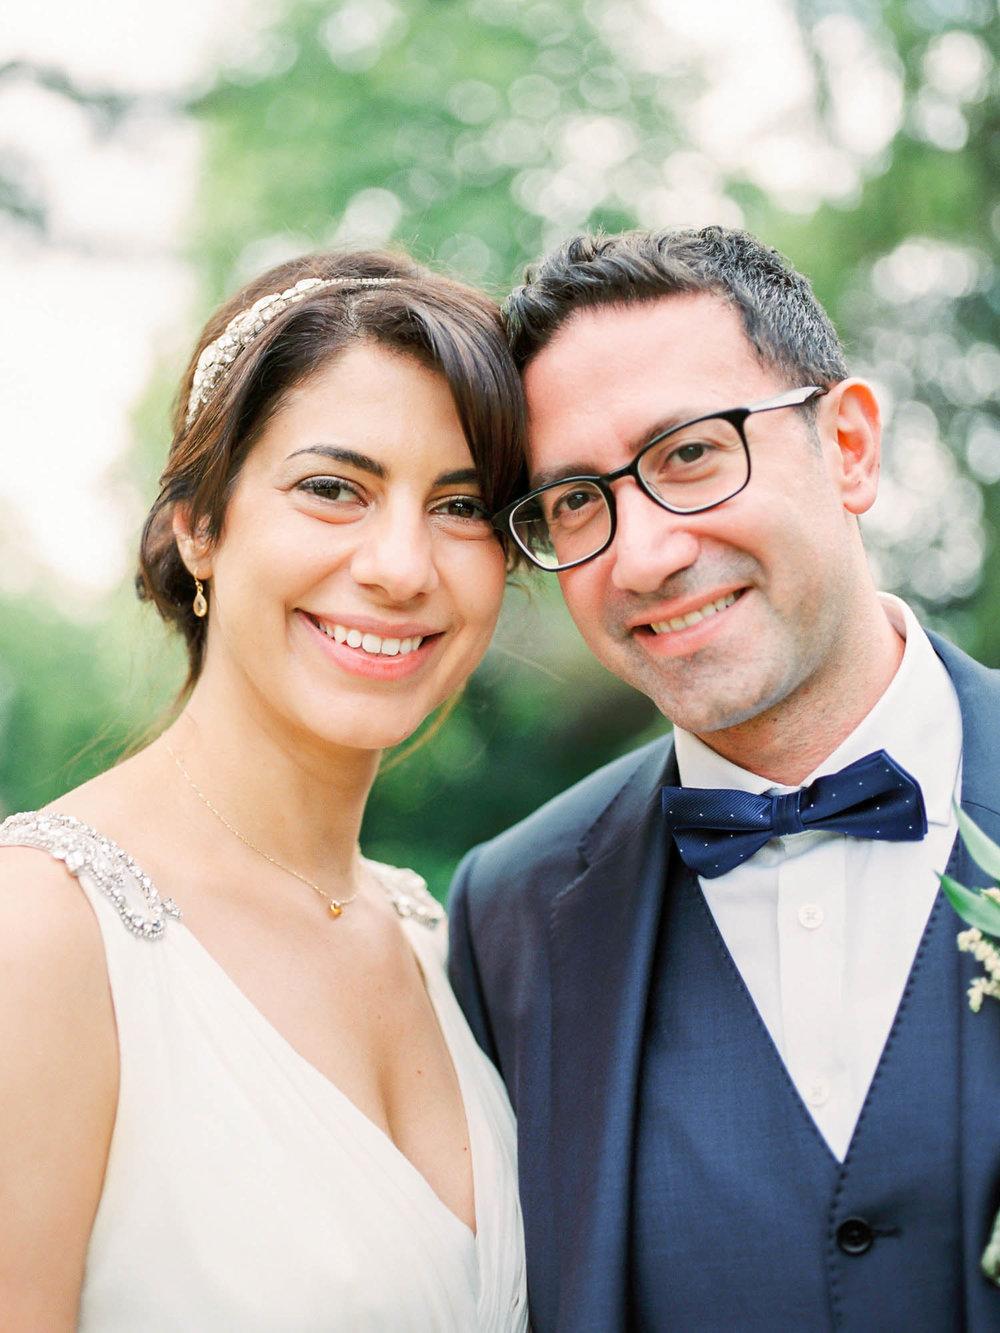 Amy O'Boyle Photography- Destination & UK Fine Art Film Wedding Photographer- Brickendonbury Estate Wedding-23.jpg